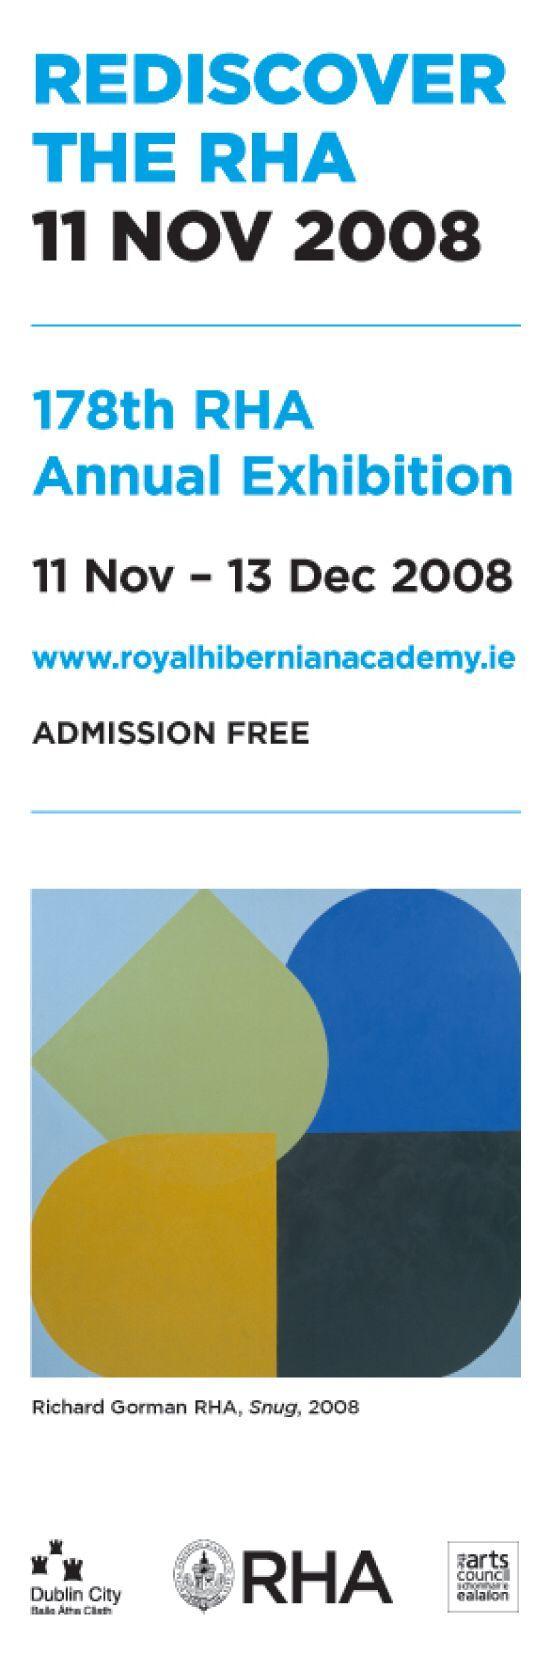 Dublin Street Banners for Rediscover the RHA, featuring 'Snug' by Richard Gorman #civicmedia2008